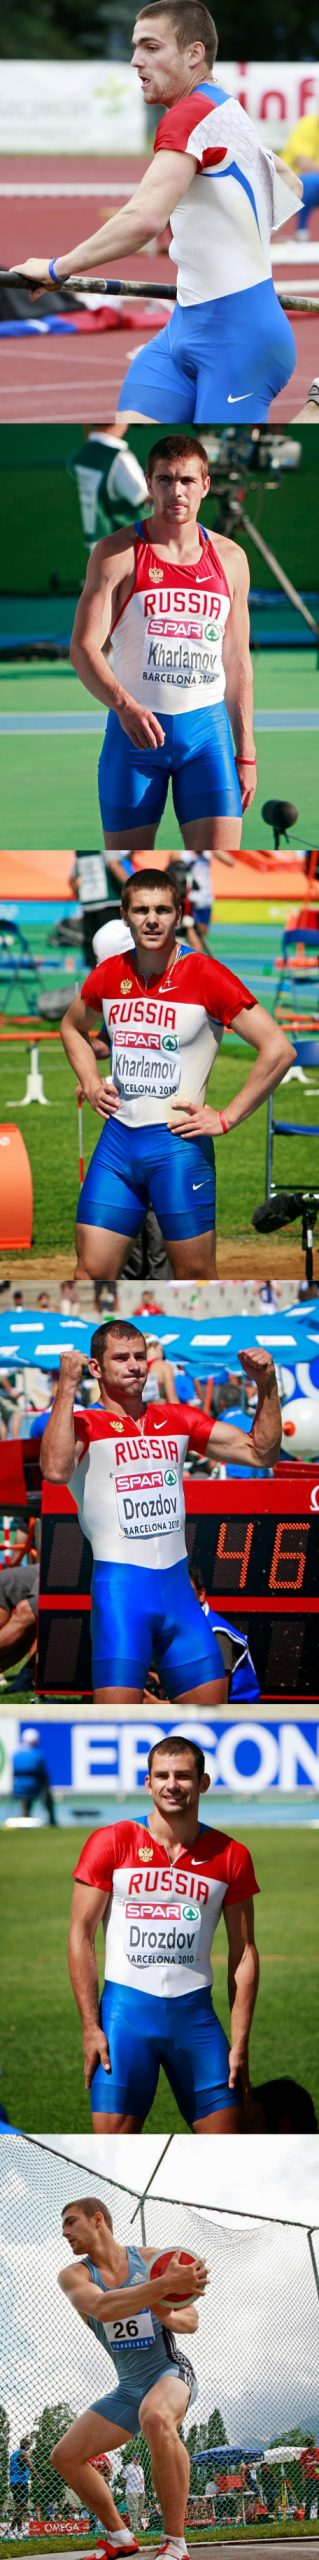 russian athlete Vasiliy Kharlamov bulge